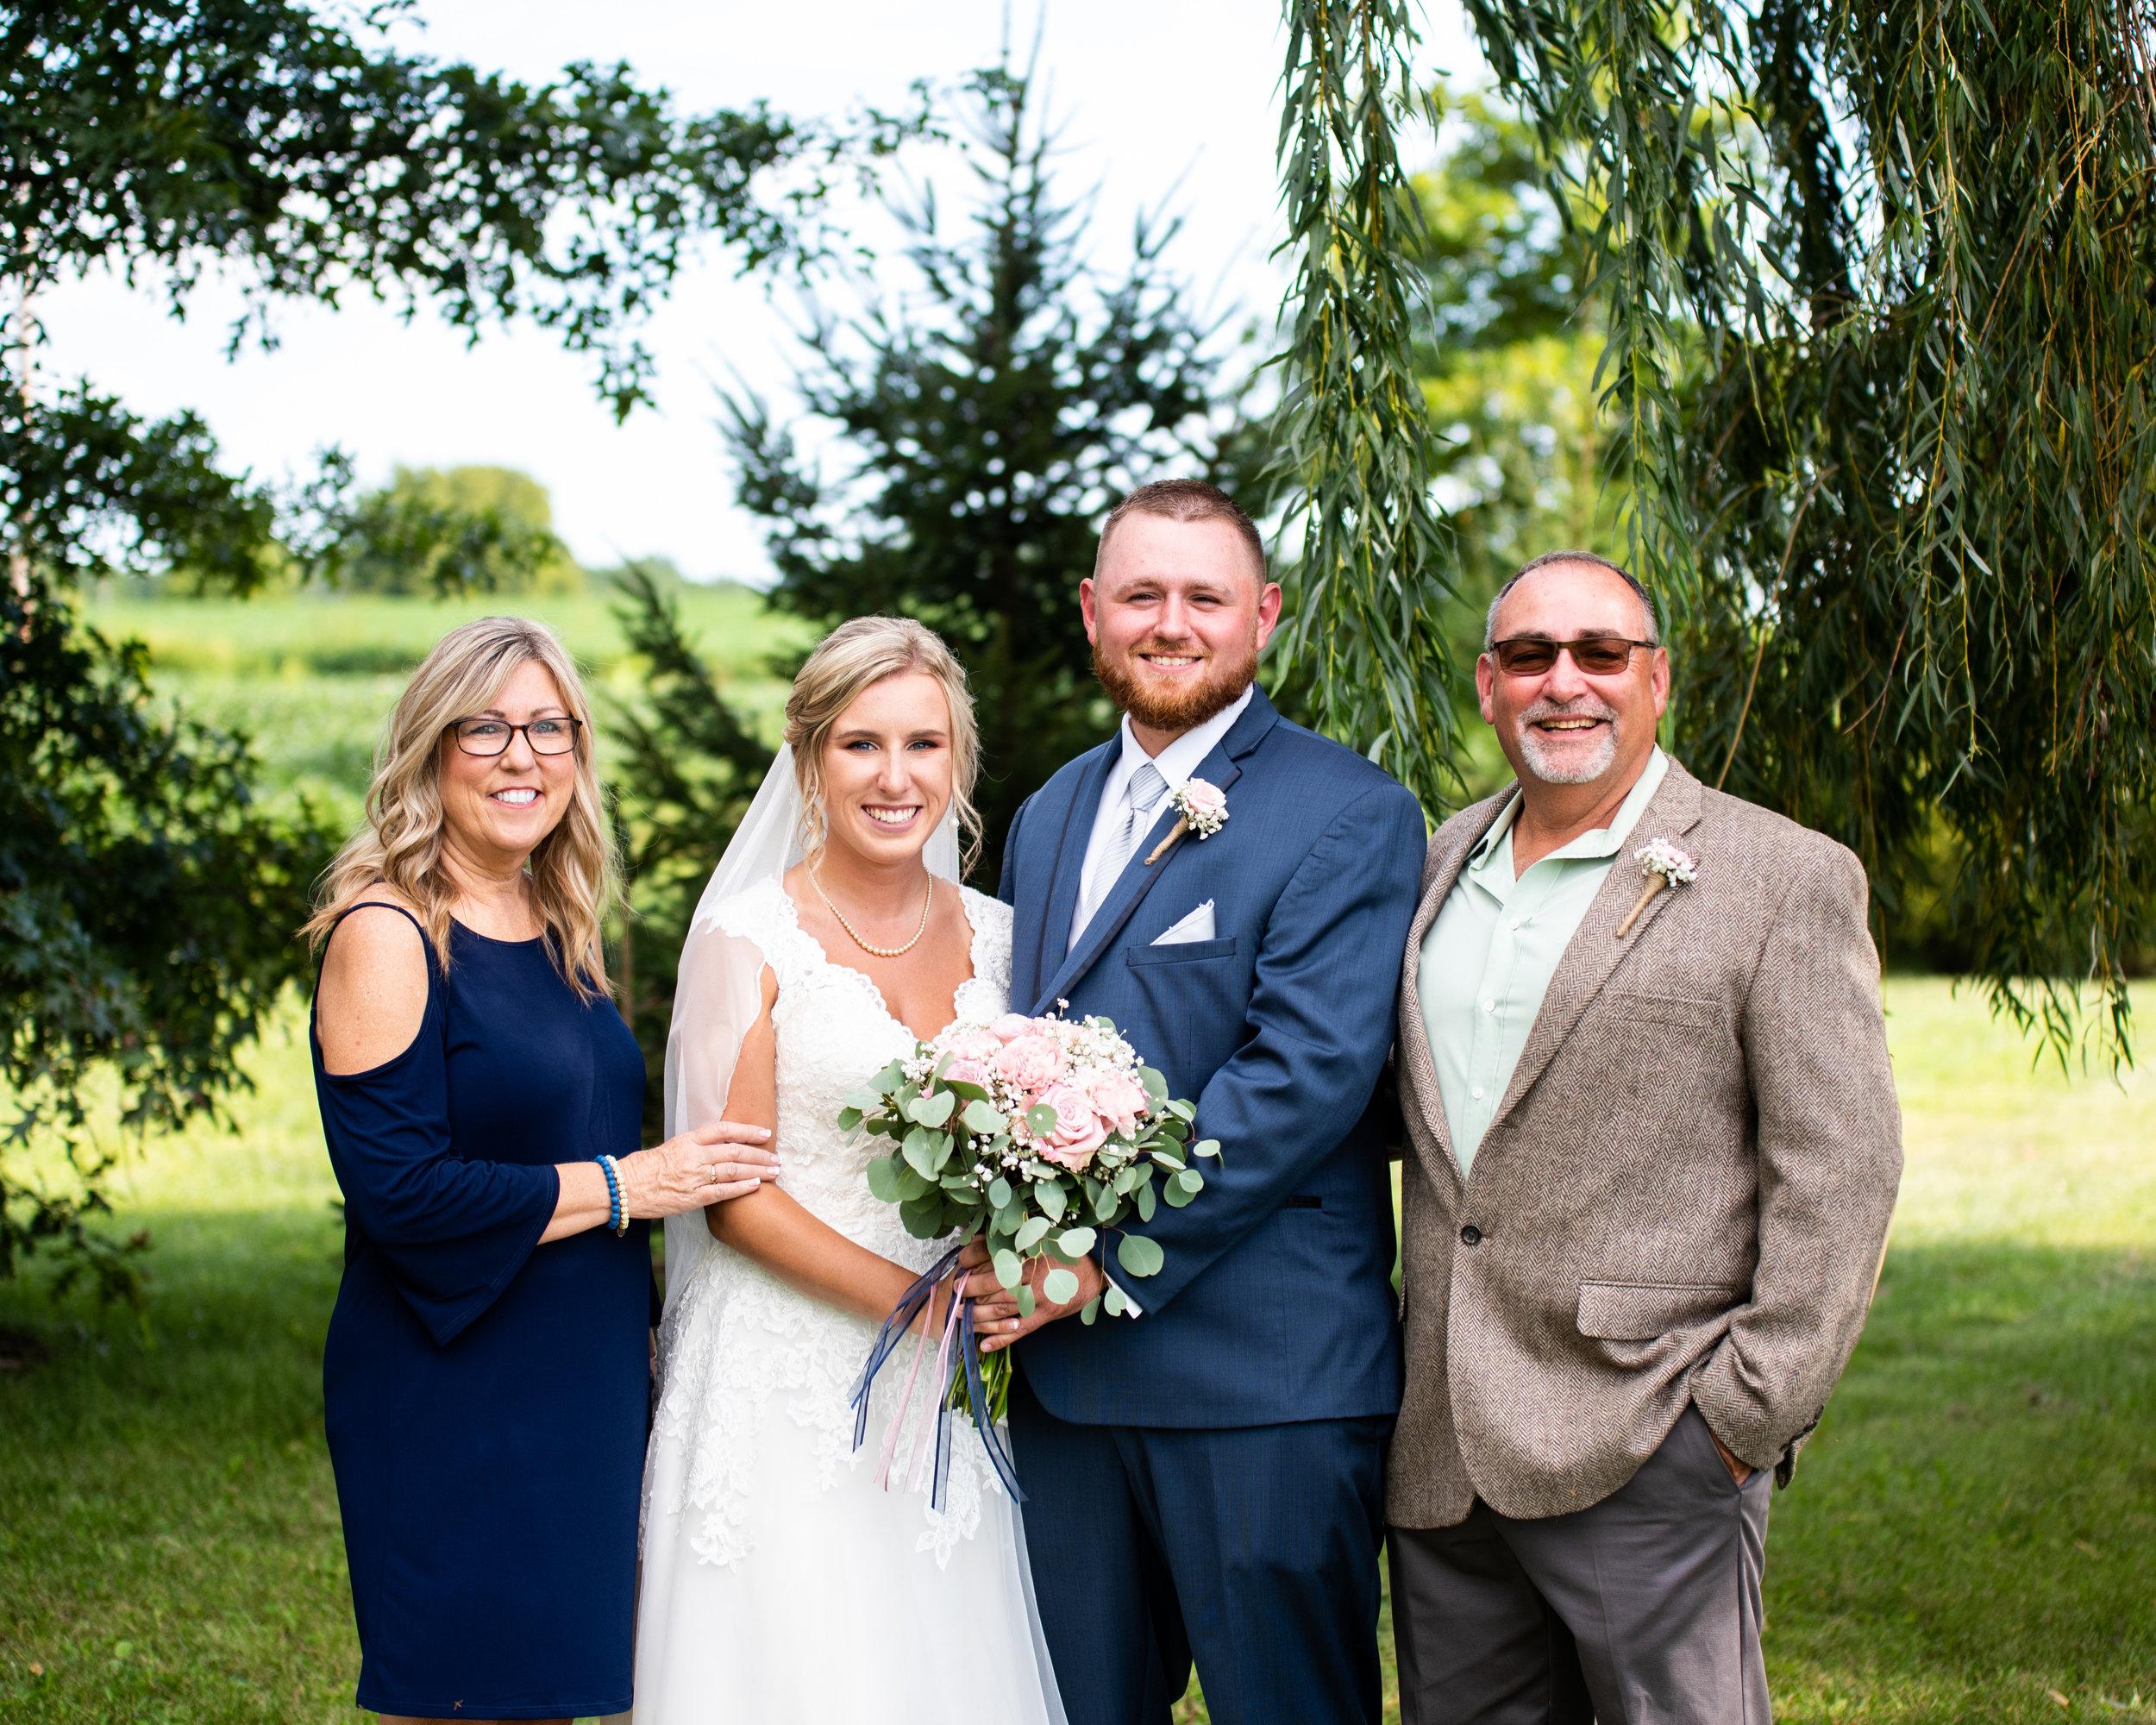 wedding (1 of 1)-112.jpg